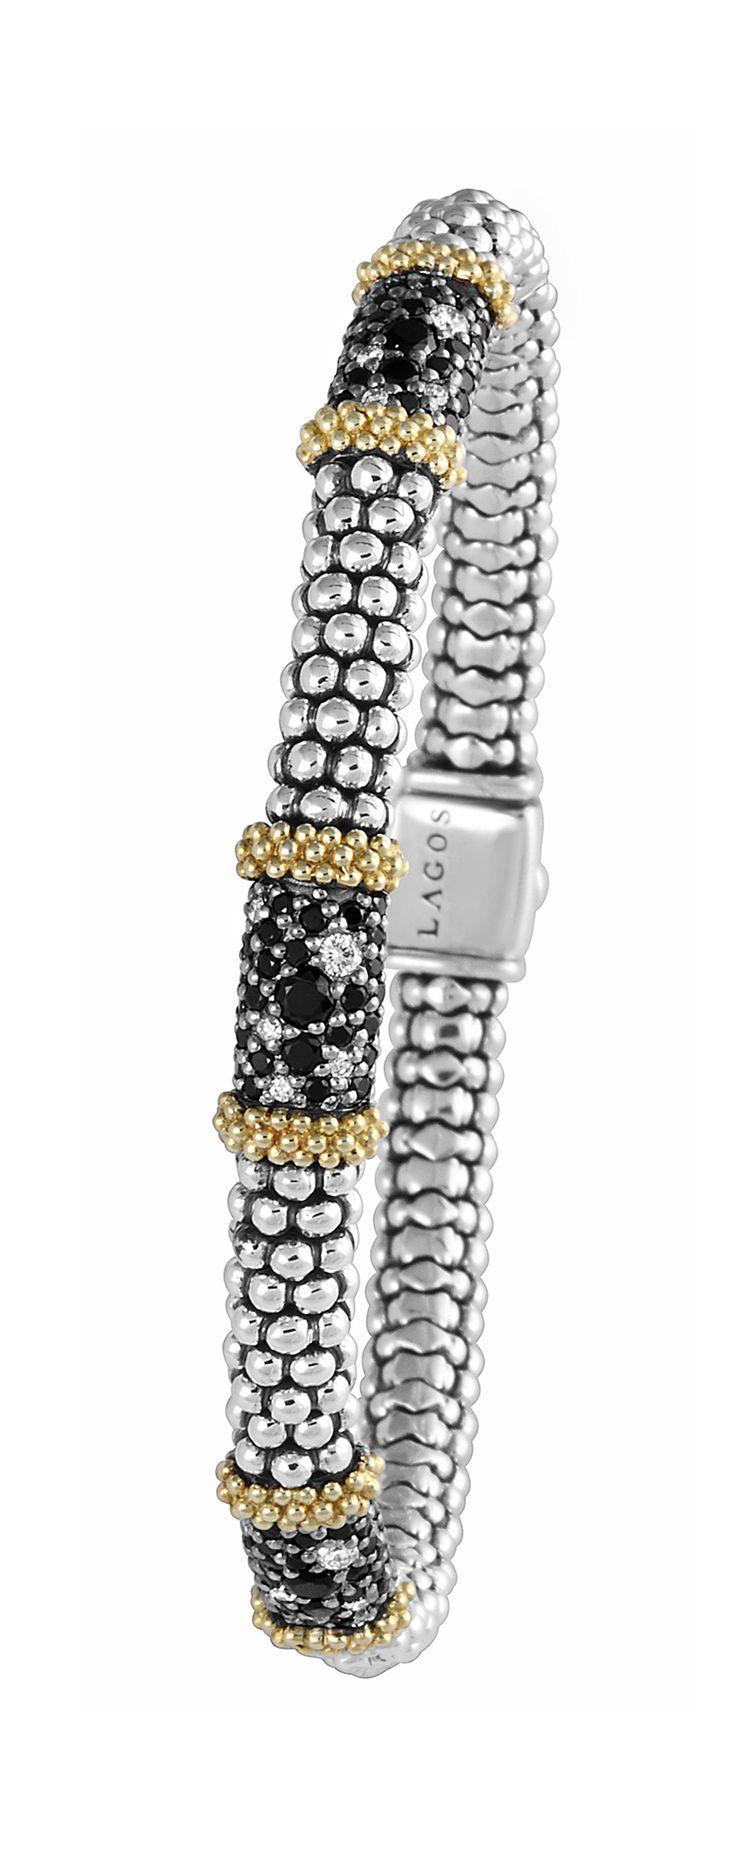 Lagos Pearl Jewelry